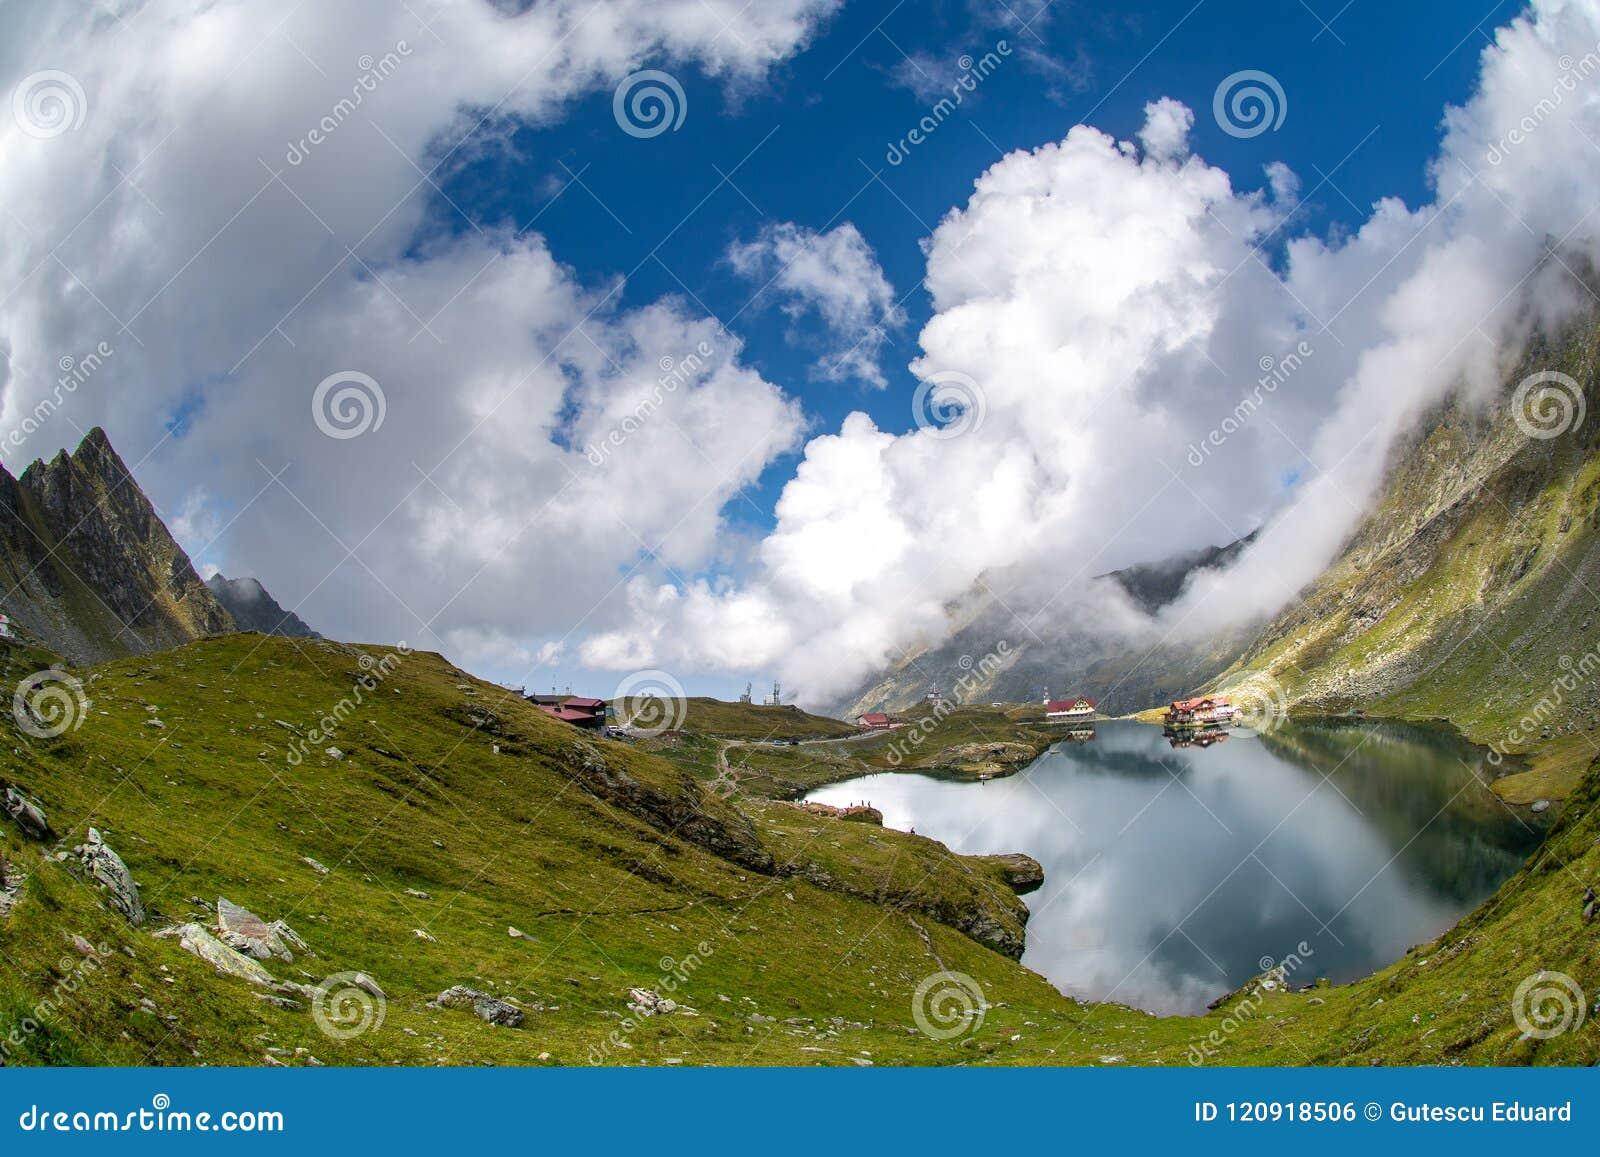 Balea glacier lake, Transfagarasan road in Romania Carpathian Fagaras mountains